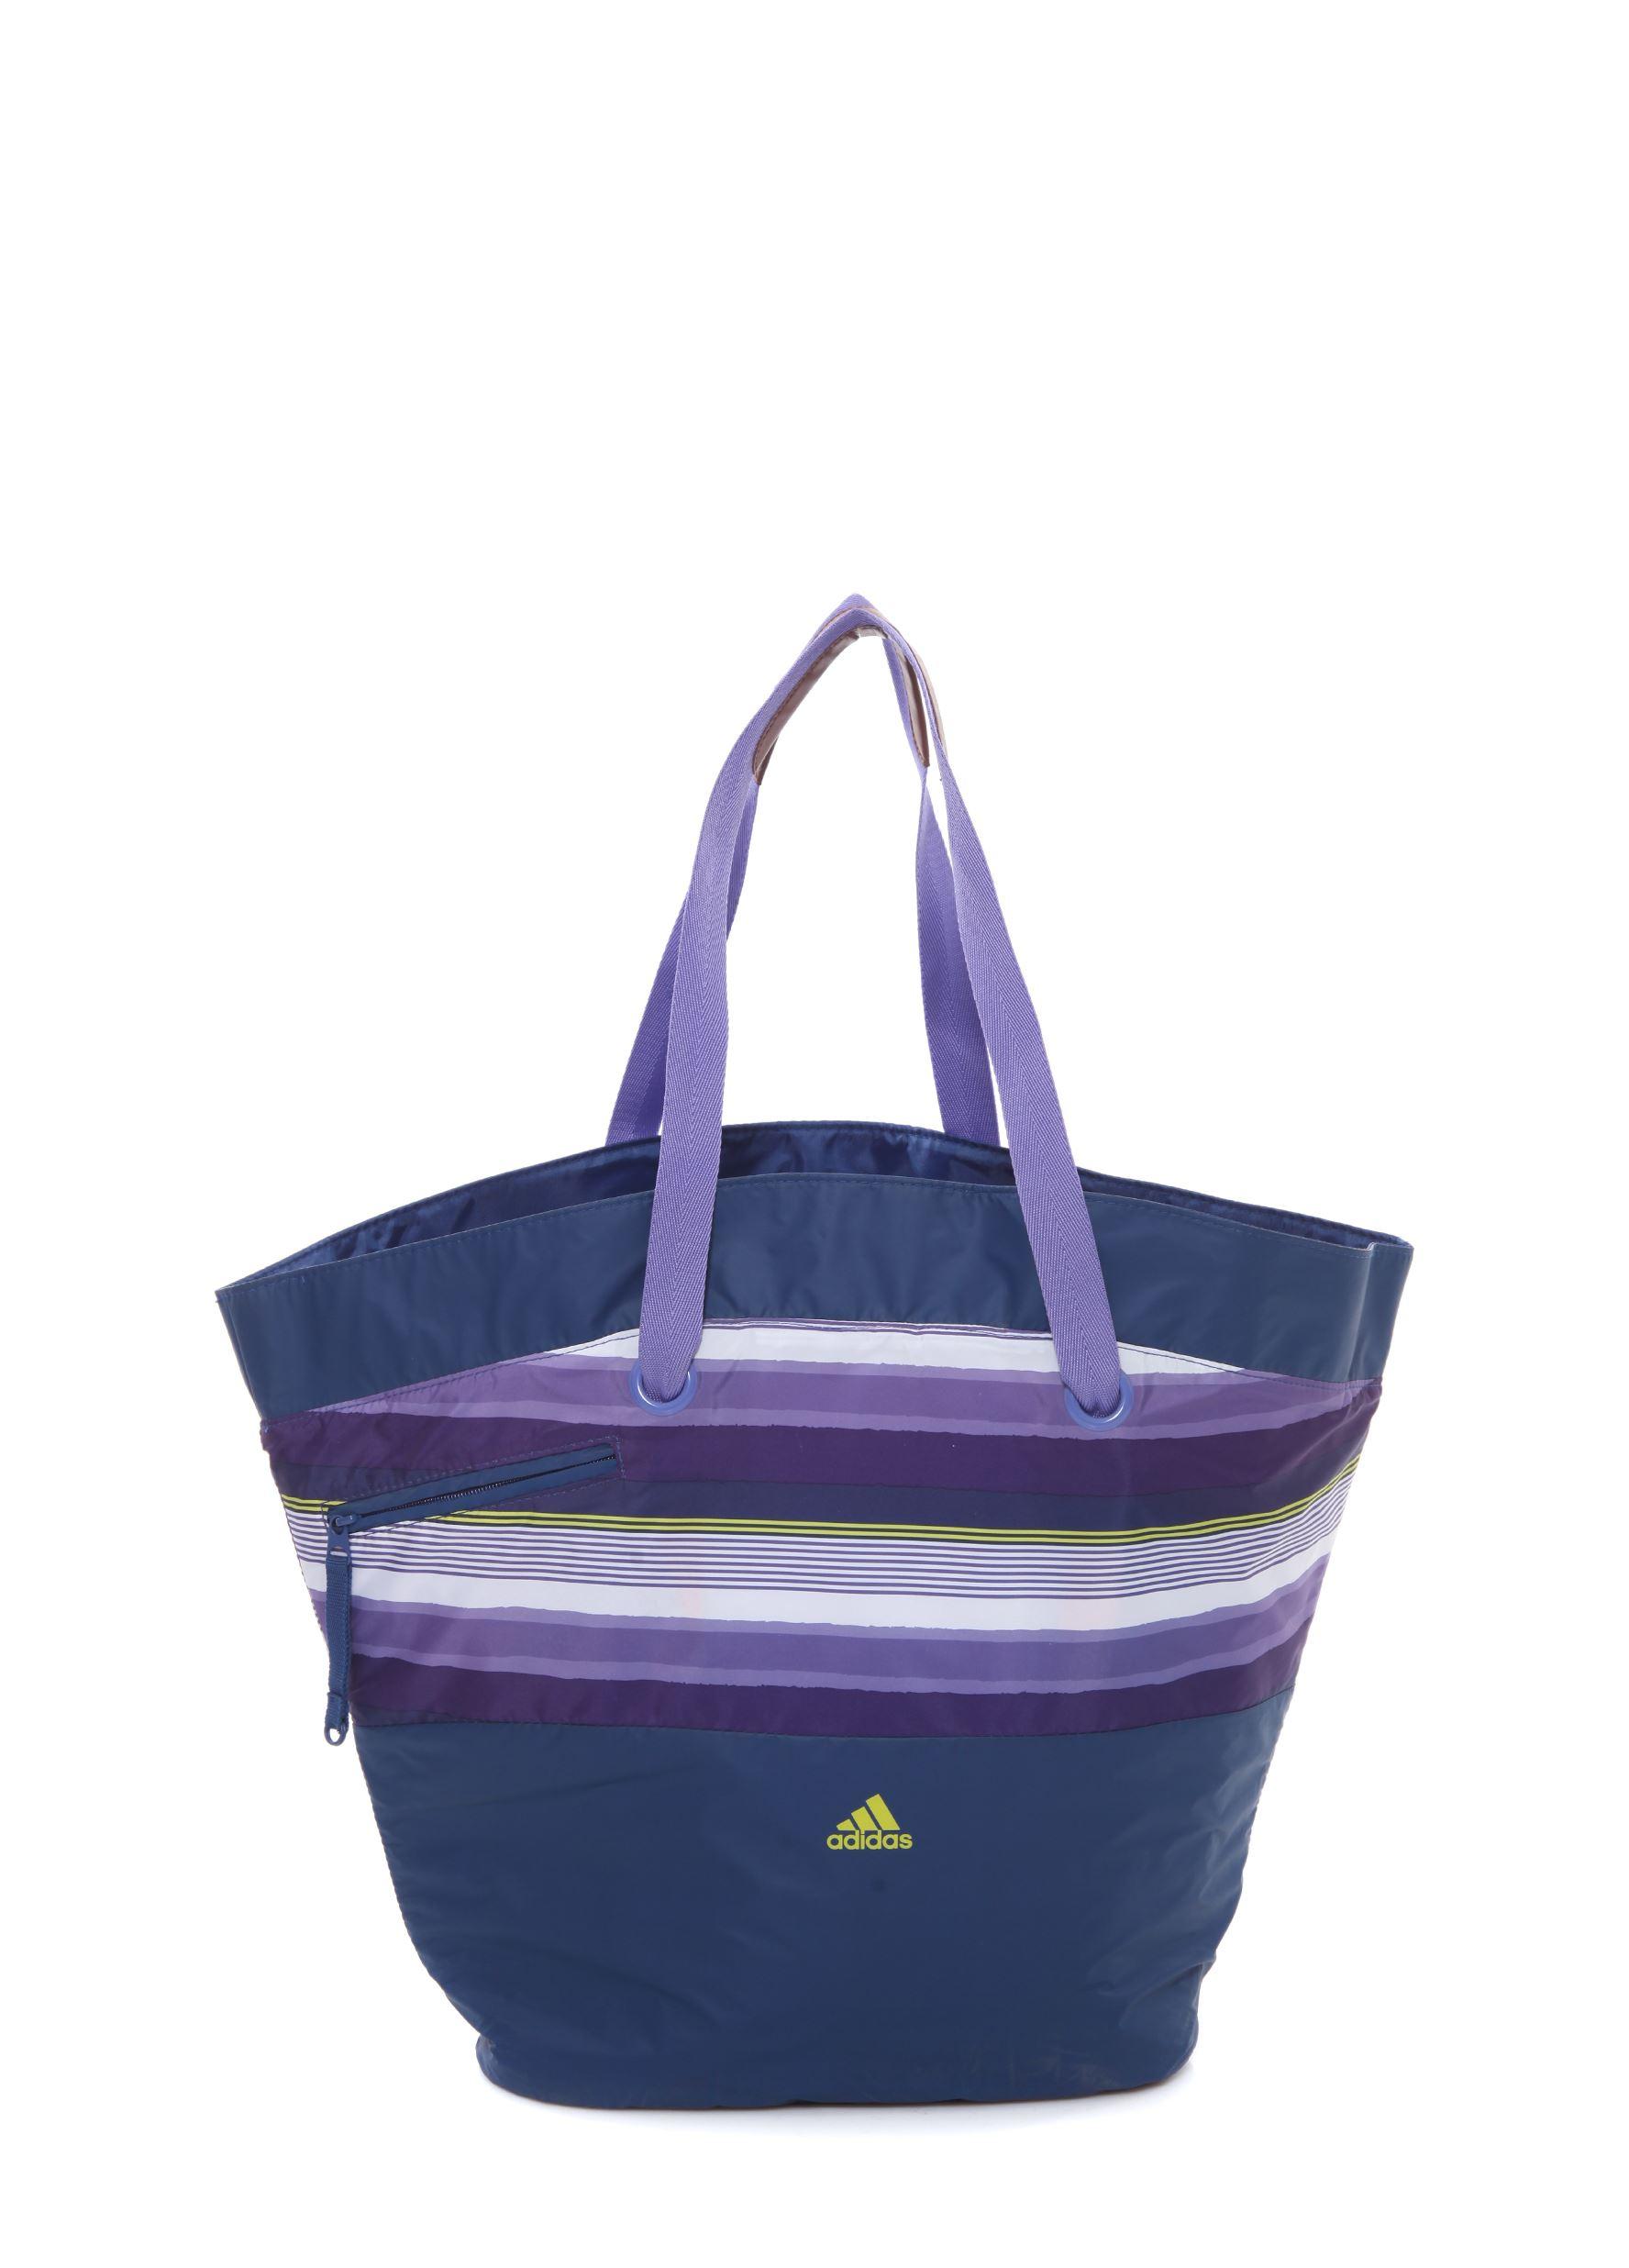 Adidas & Reebok Accessories - Γυναικεία Τσάντα ADIDAS